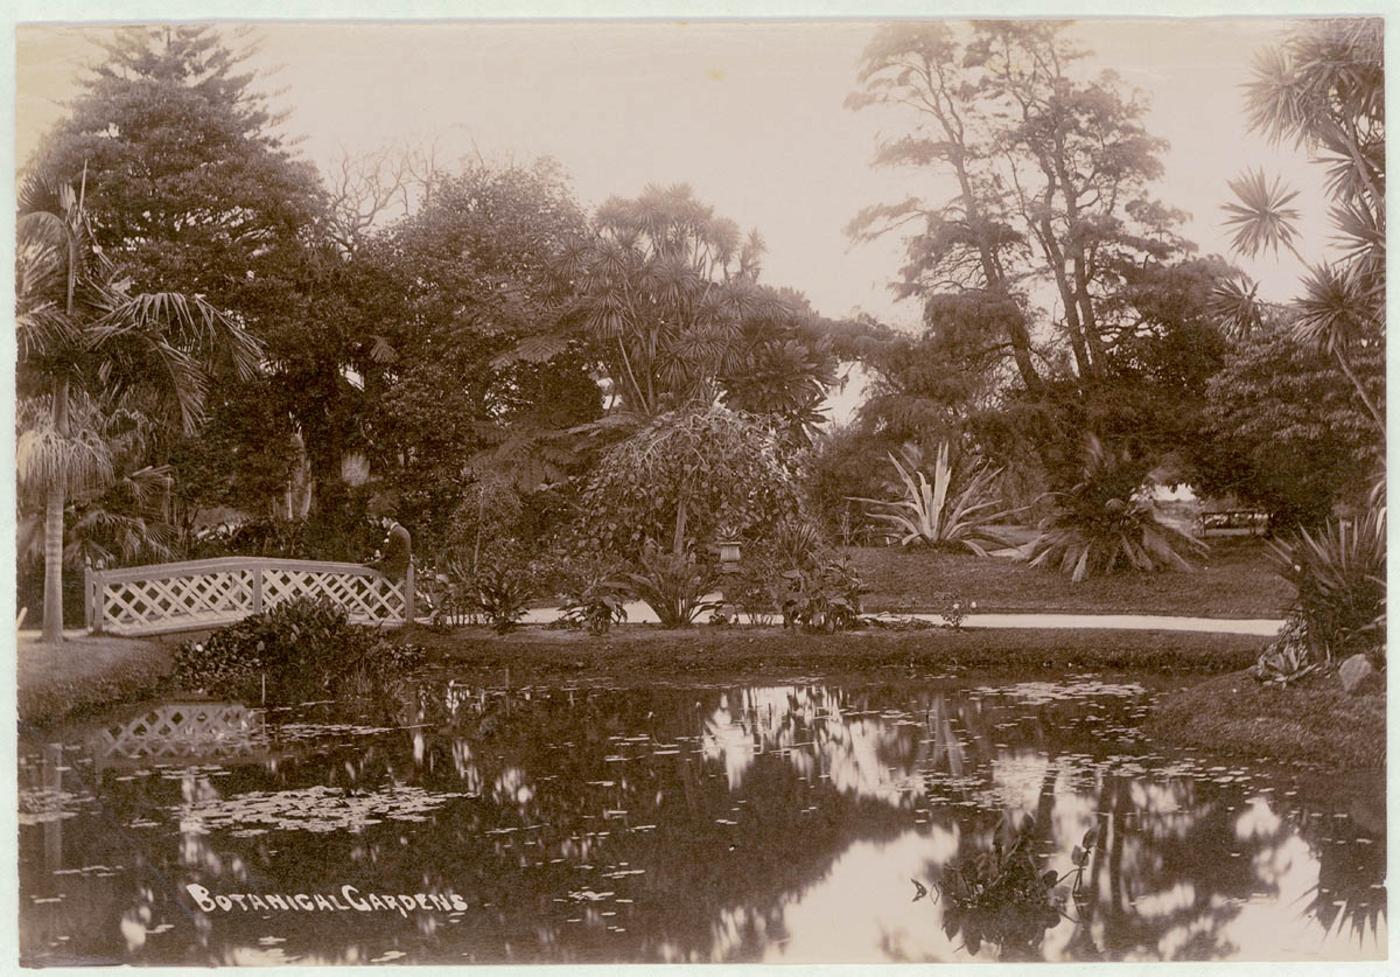 Botanical Gardens, Sydney, c. 1900-1910